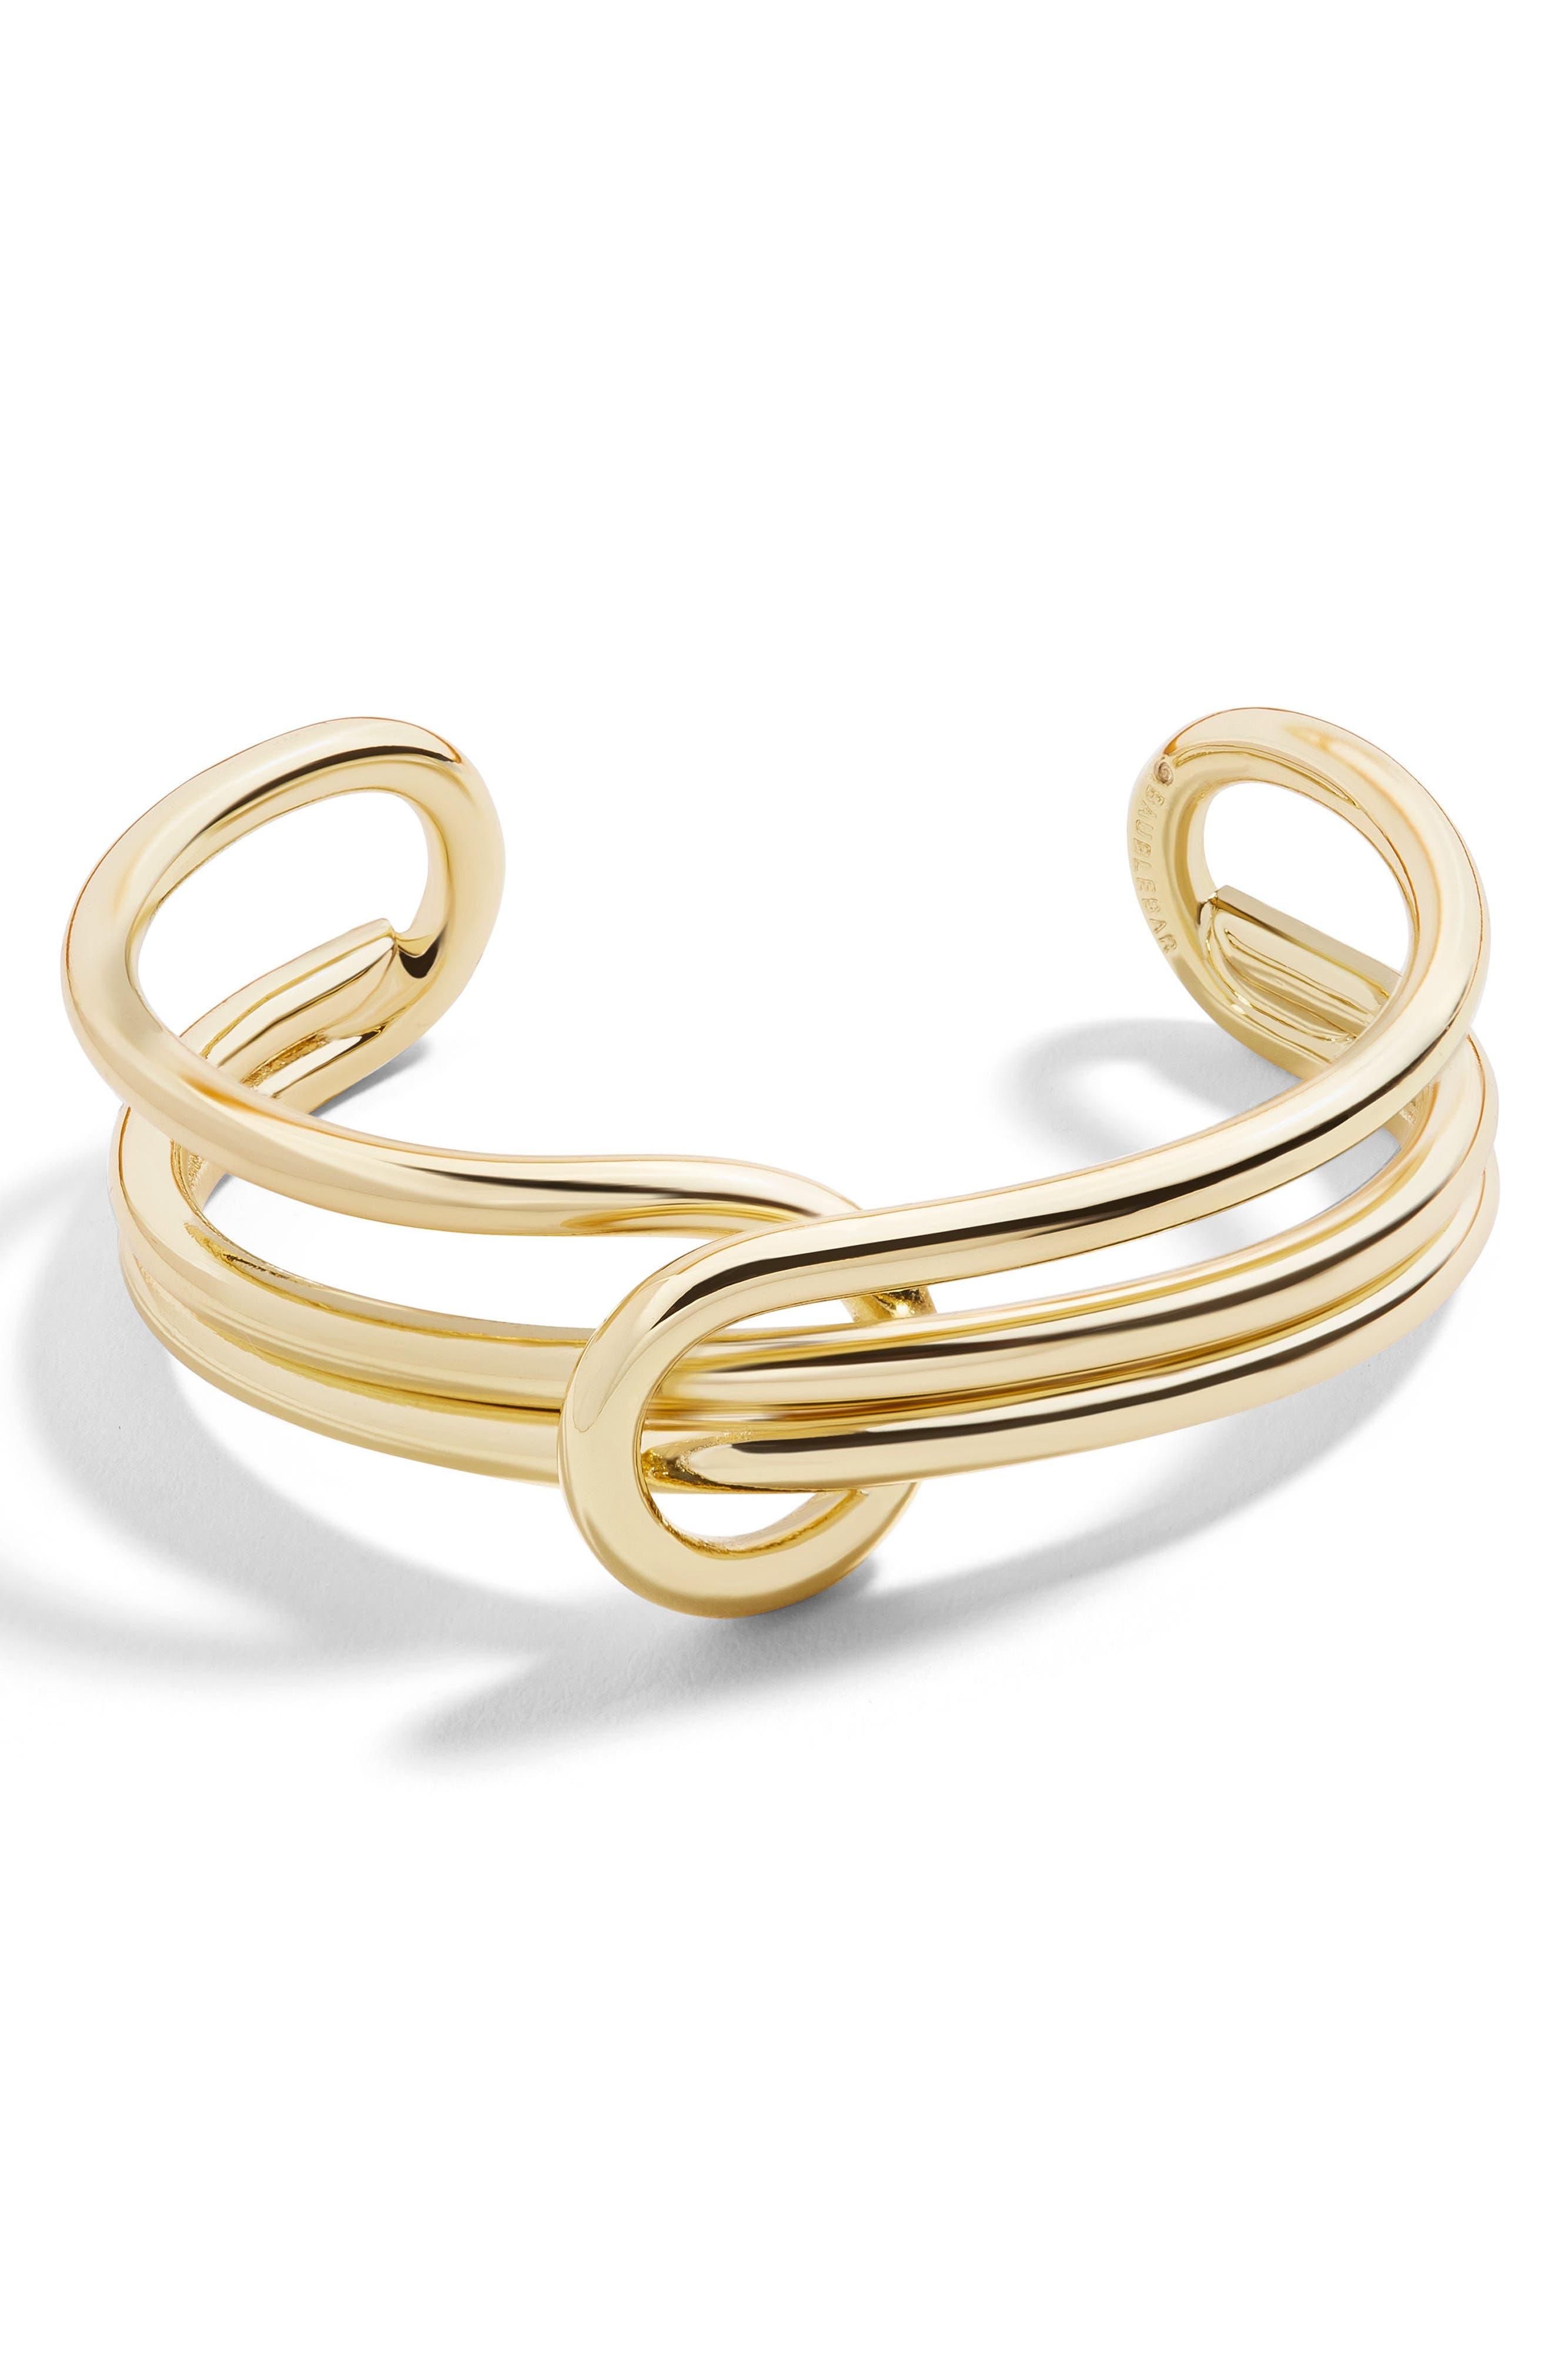 Shyanna Cuff Bracelet,                         Main,                         color, Gold